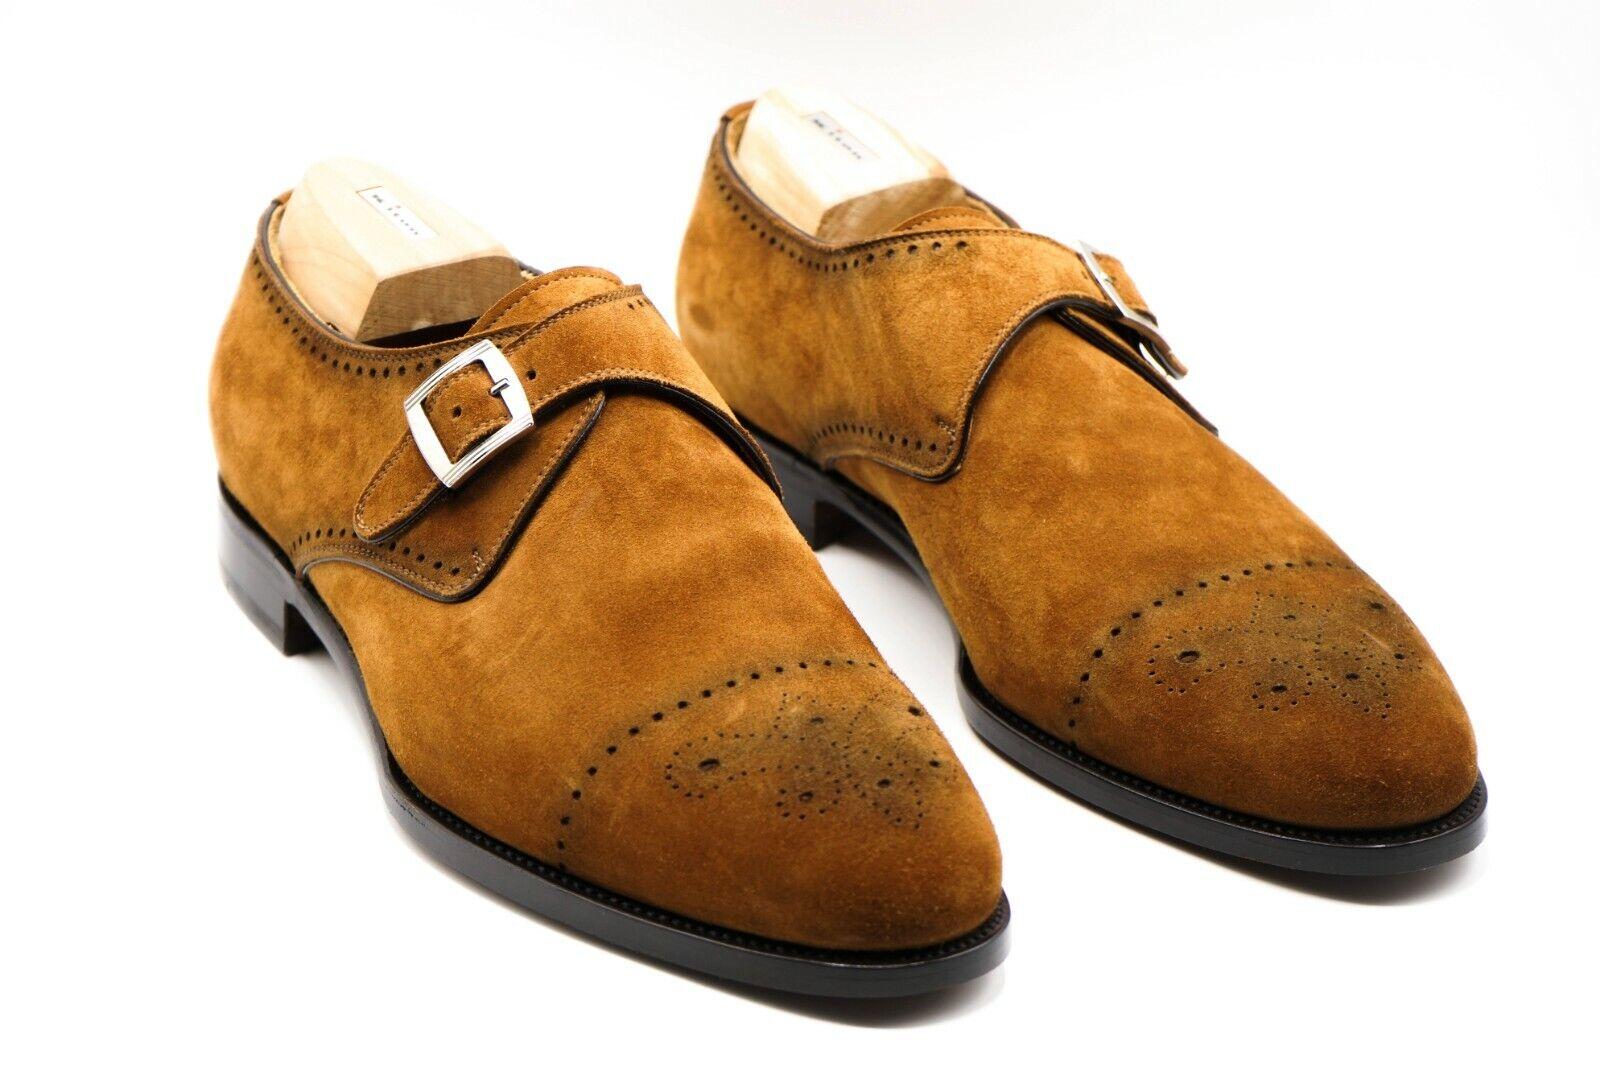 NEW KITON Napoli Dress Leather Shoes Size Eu 43.5 Uk 9.5 Us 10.5 (KIS43)